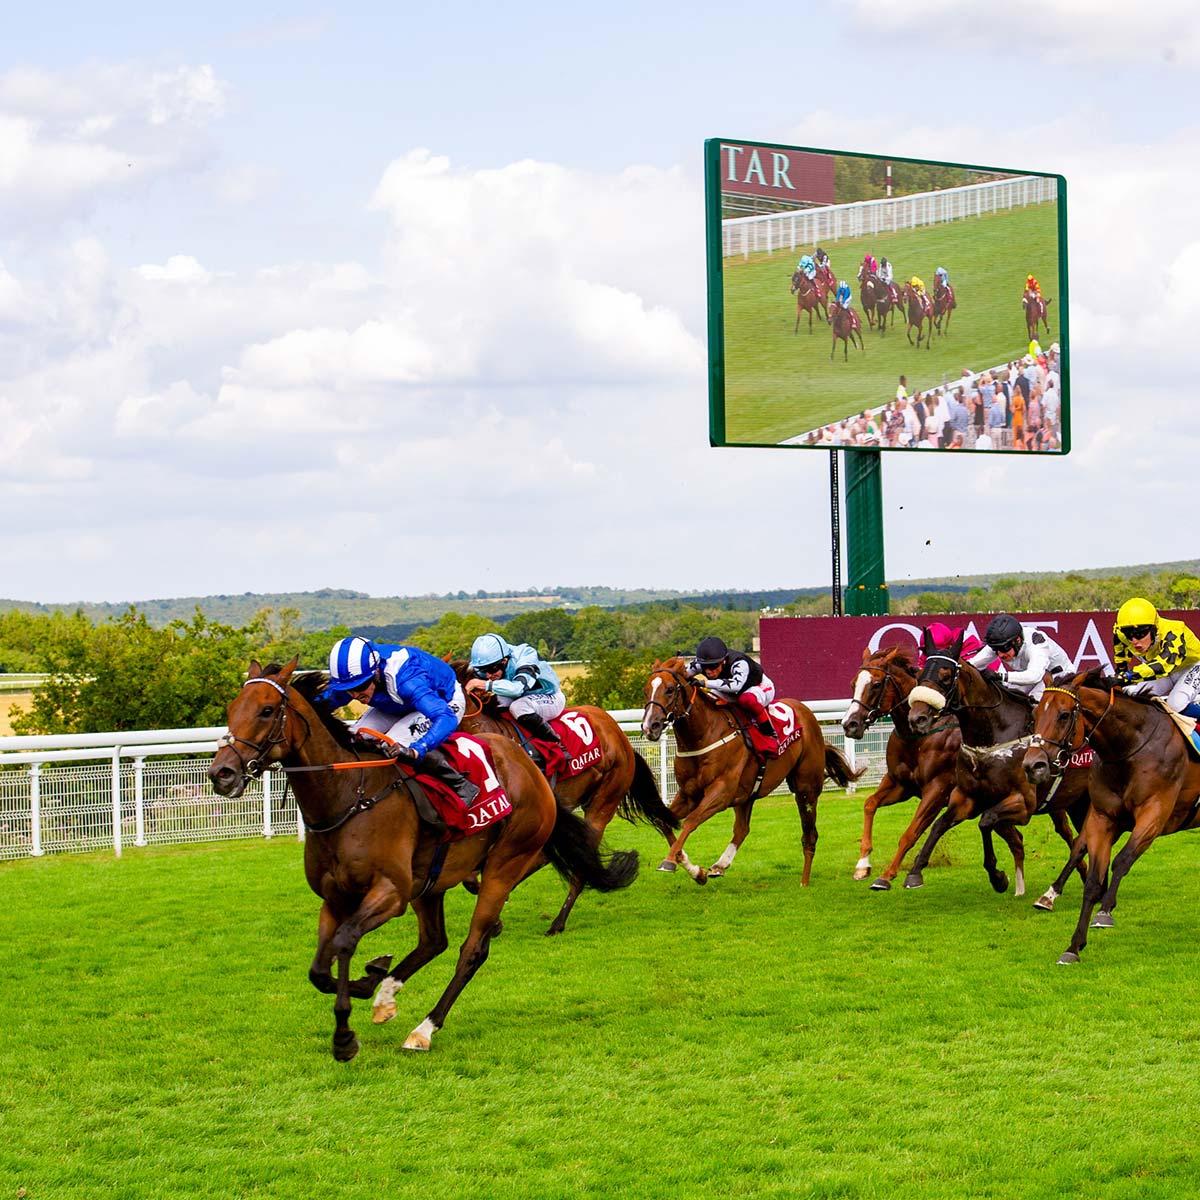 Goodwood Qatar Horses-Racing Epoch revolving screen